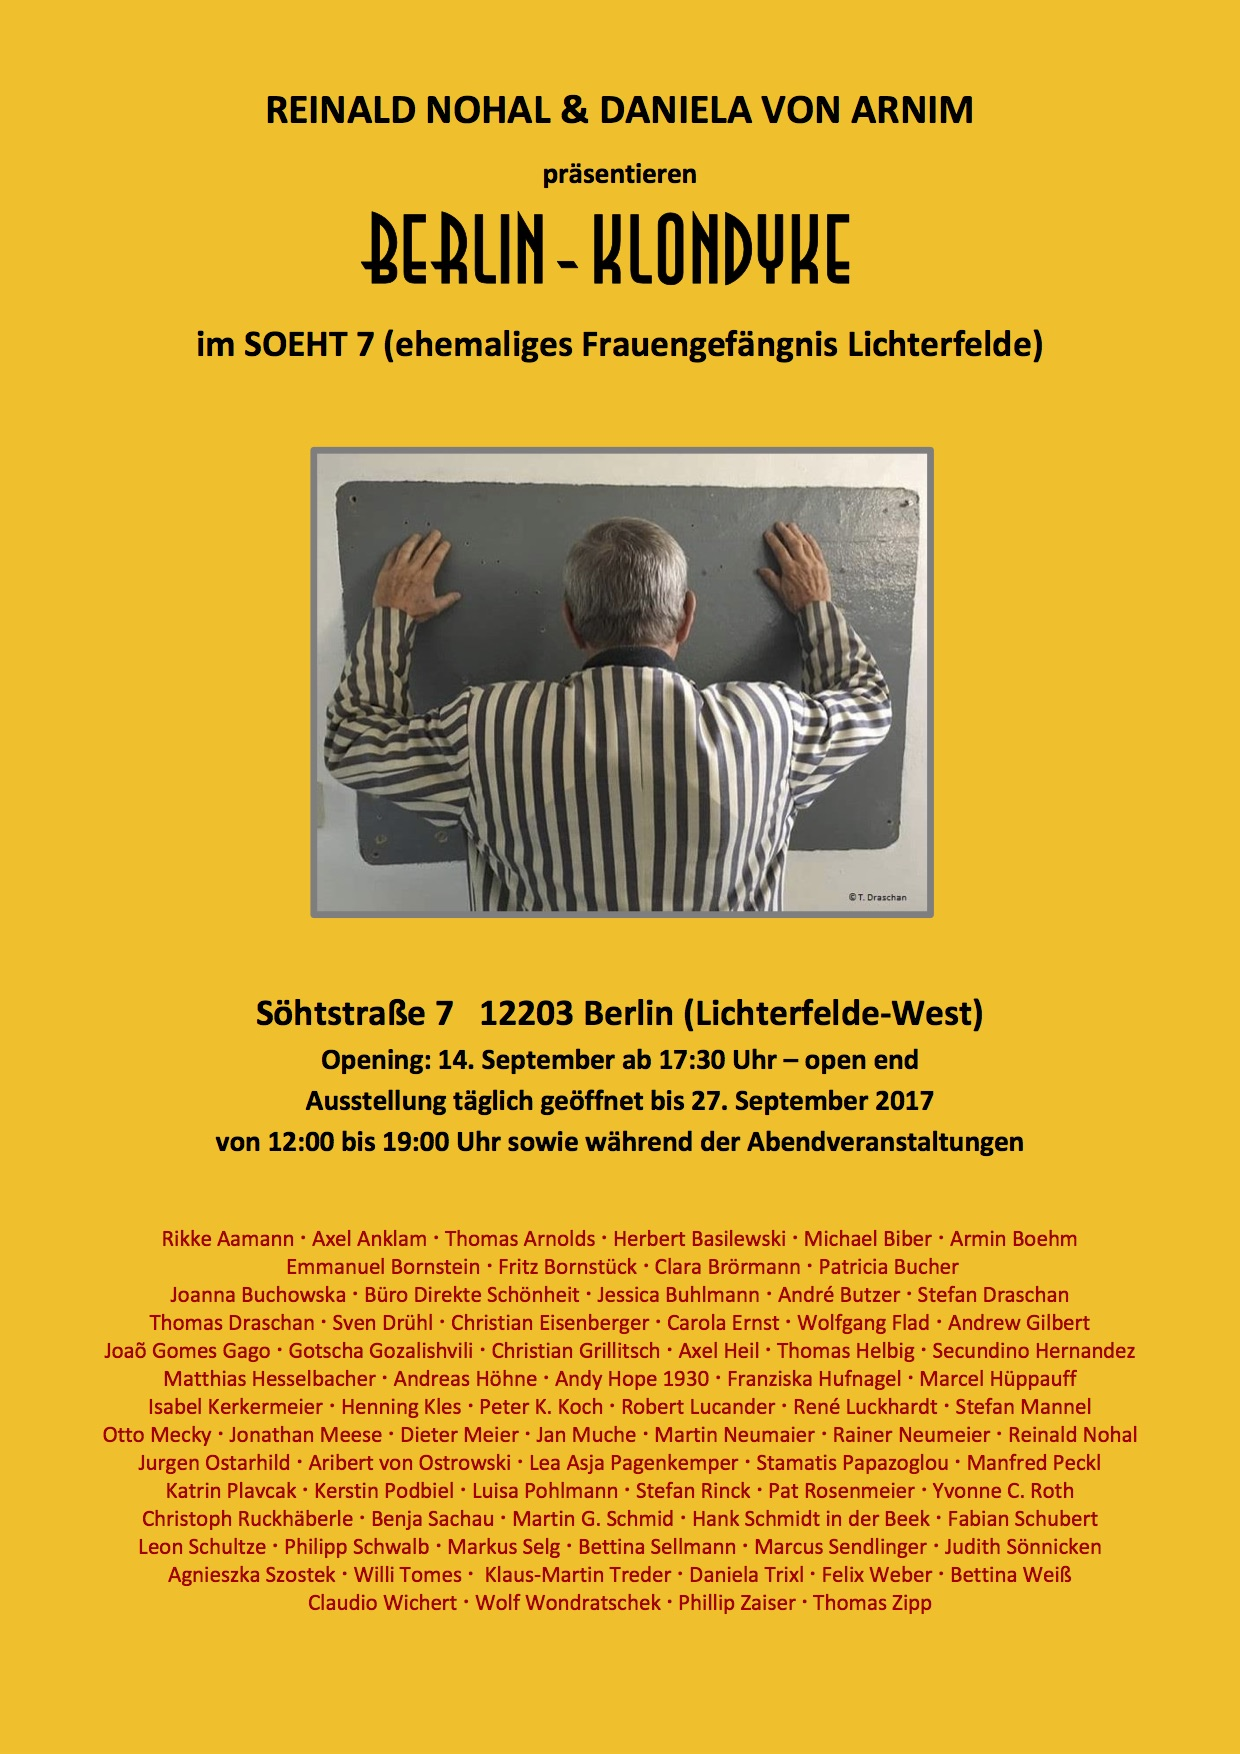 Einladung Berlin-Klondyke im Soeht7